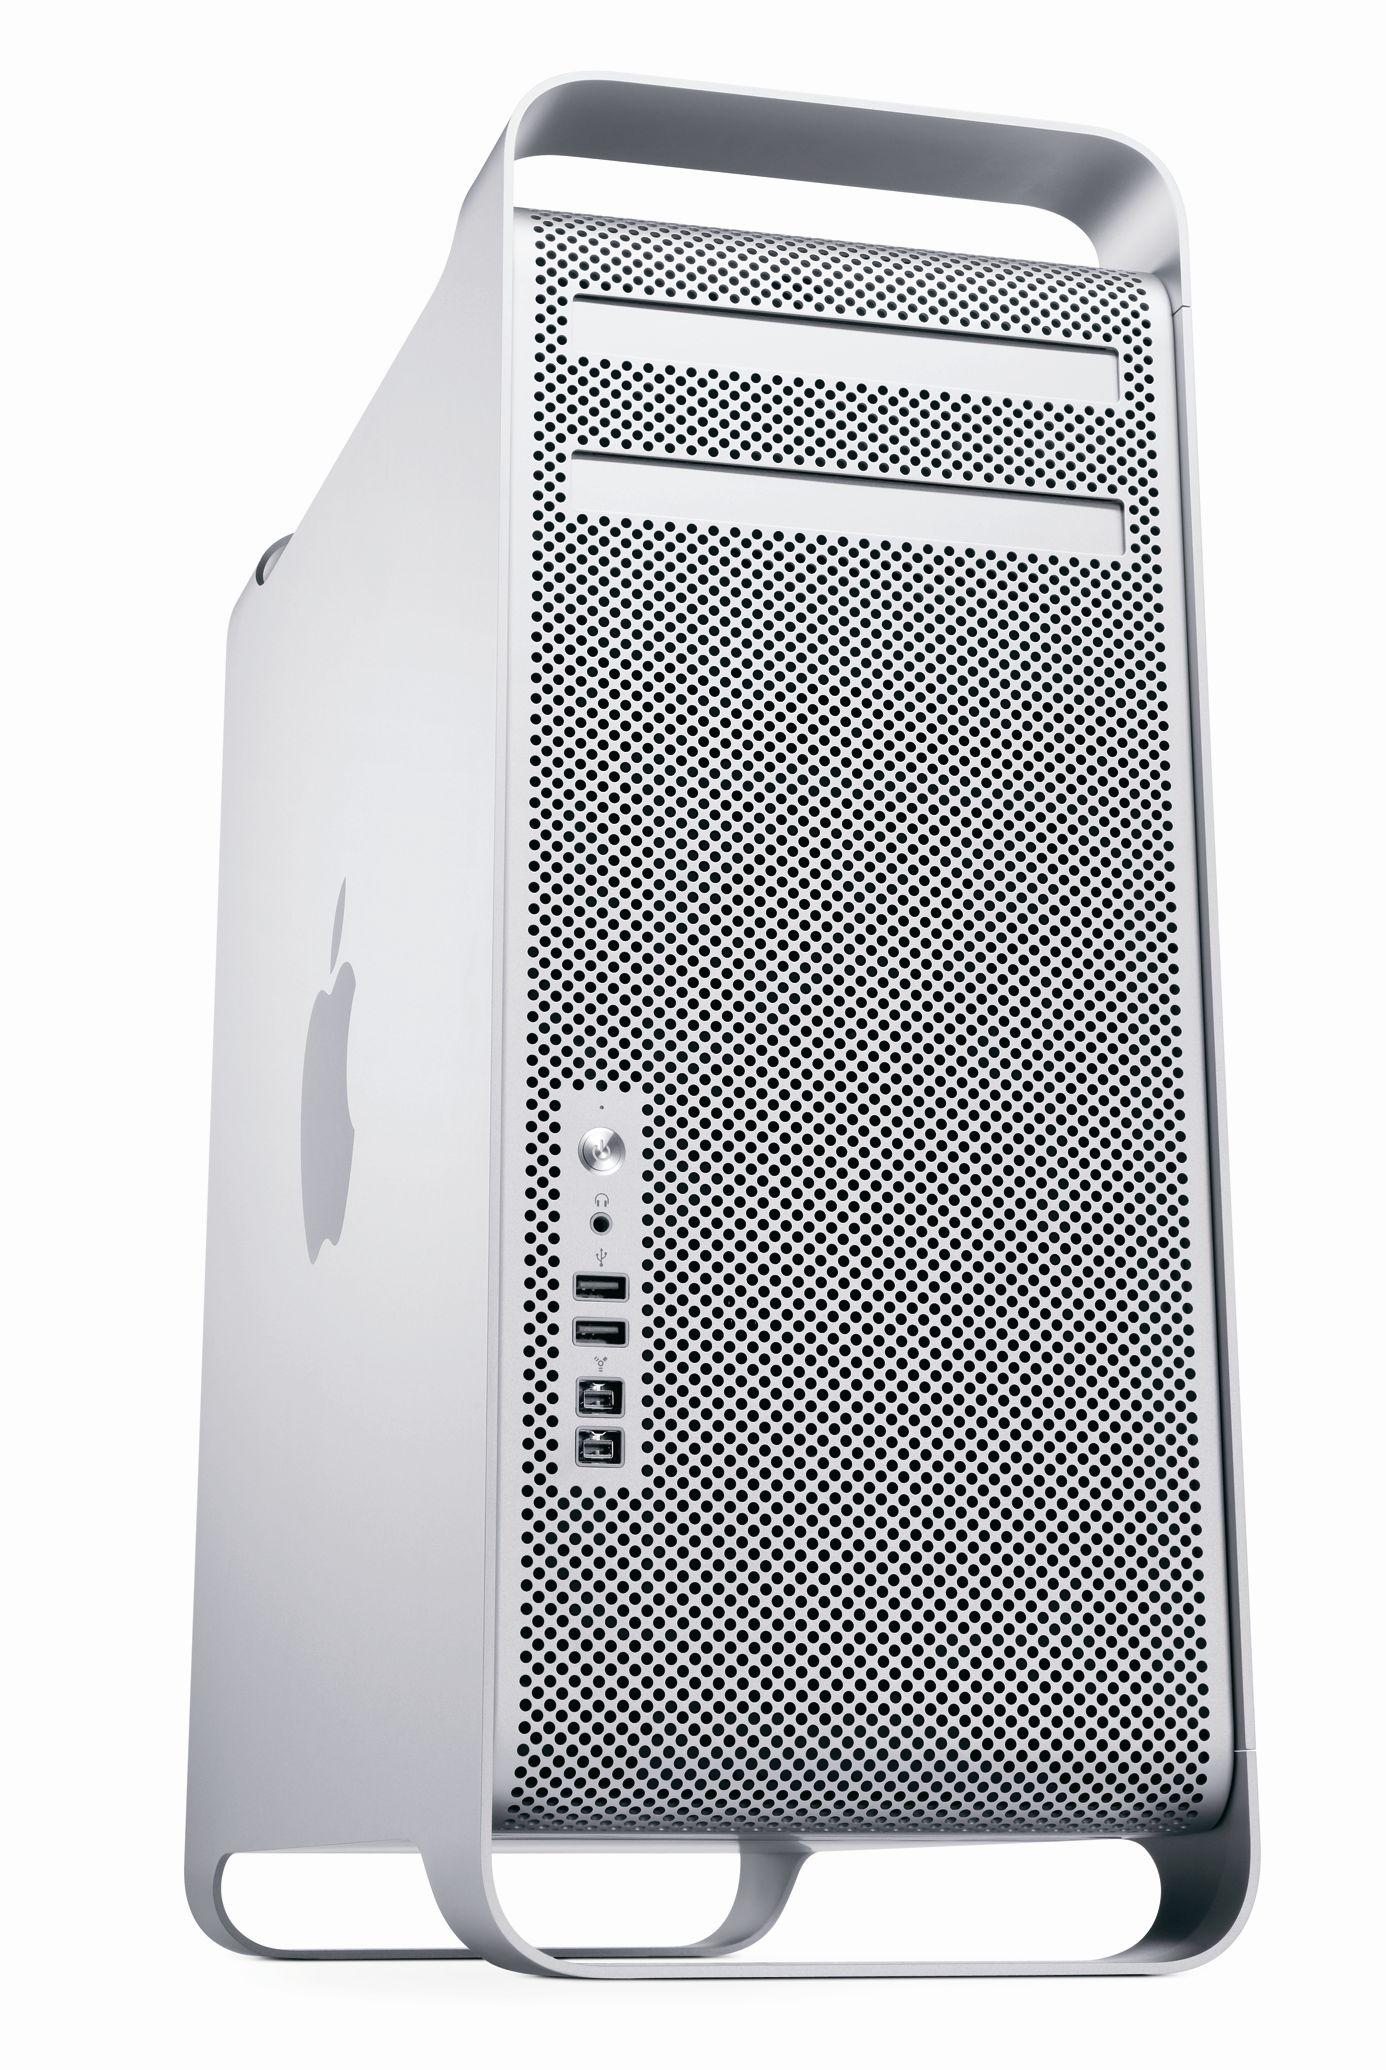 Refurbished Apple A Grade Desktop Computer Mac Pro Server 1 x 3.2GHz Quad Core Xeon W3565 (Nehalem) Processor (4 cores) (Mid 2012) MD772LL/A 8 GB DDR4 1 TB HDD Sierra 10.12 Includes Keyboard & Mouse 0